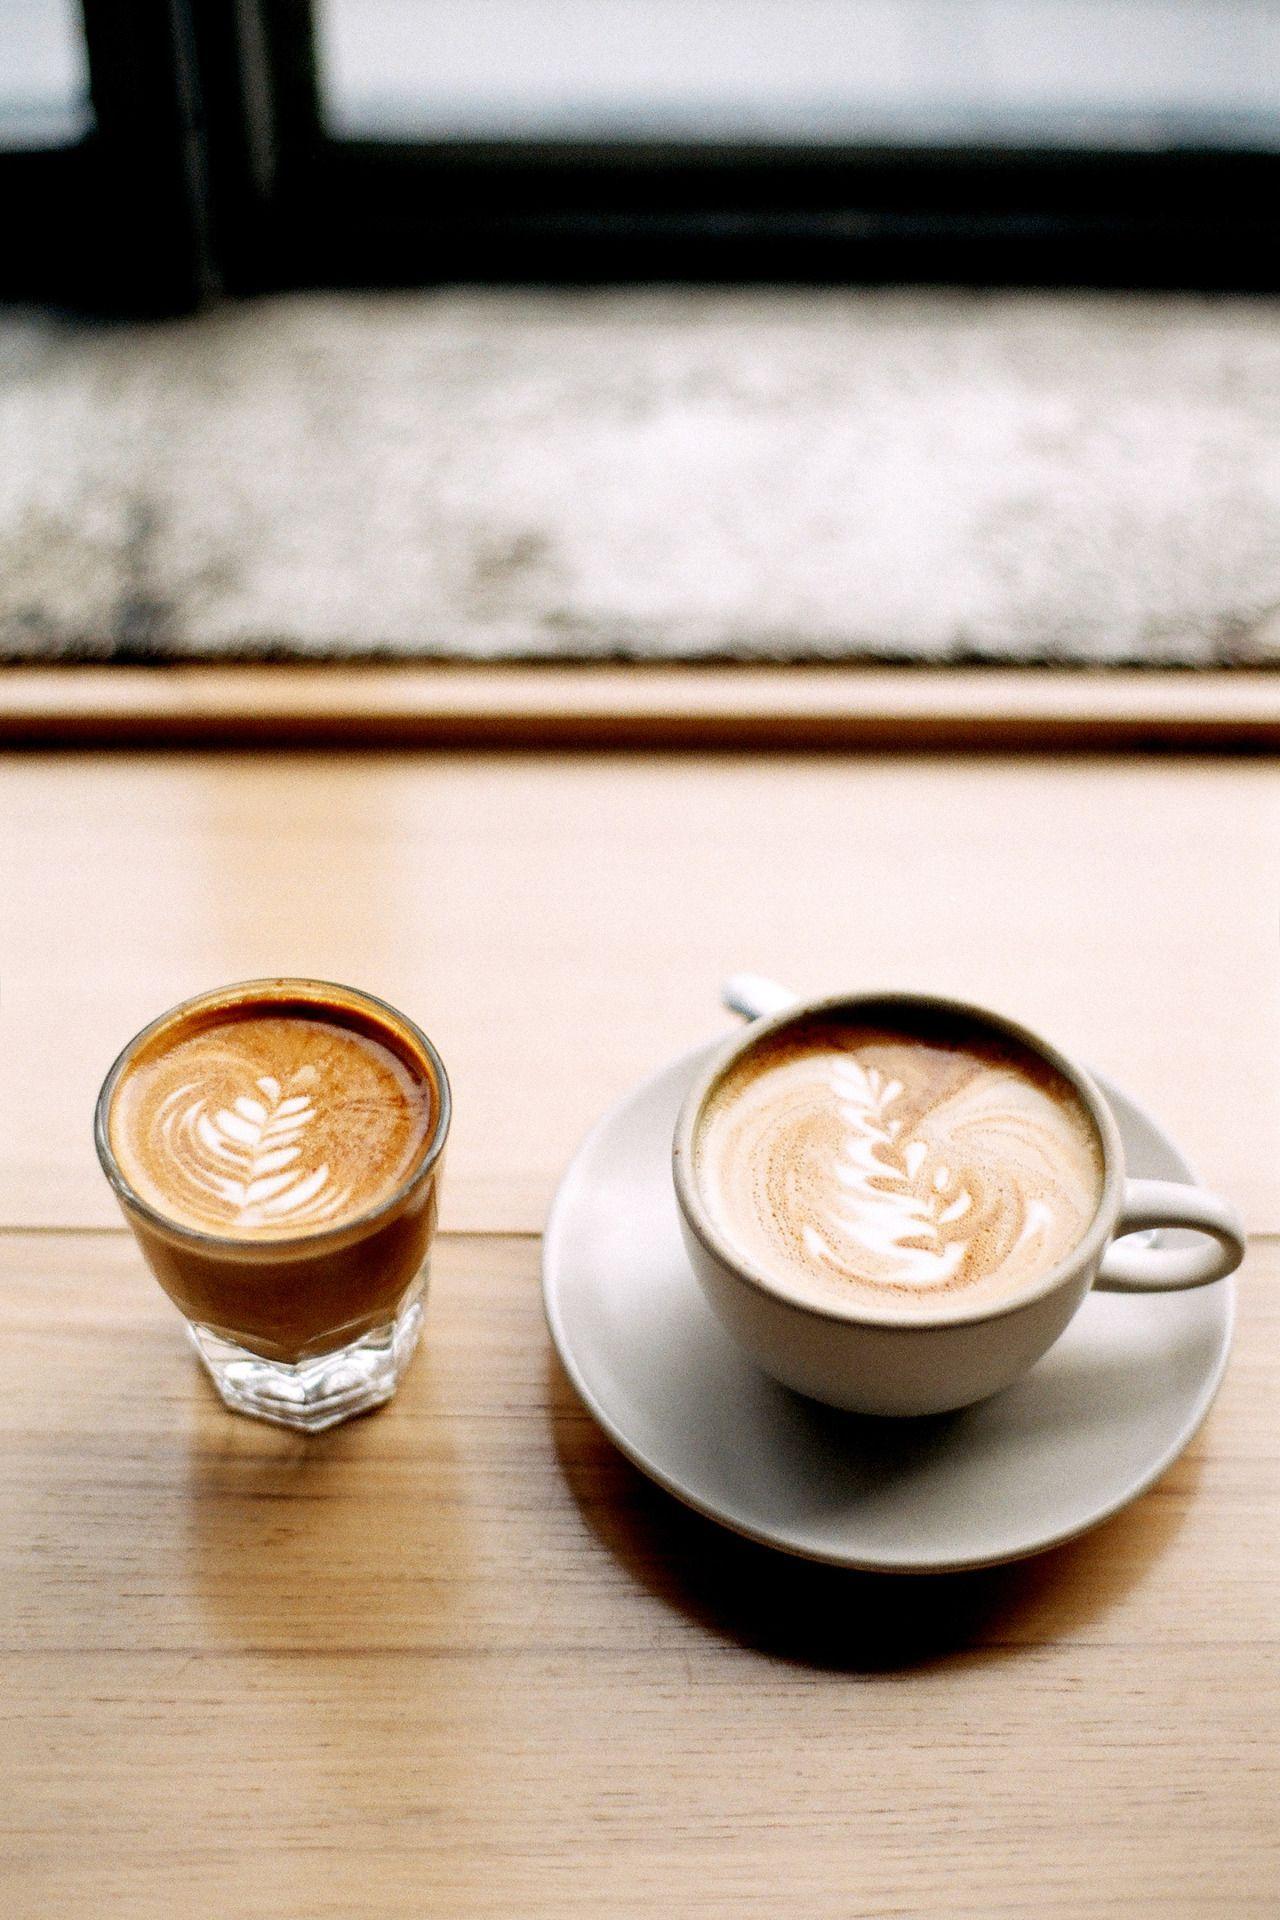 Amazing Tricks Coffee Smoothie Almond Milk Coffee Smoothie Almond Milk Coffee Wallpaper Design Cold Brew Coffee Lar Coffee Wallpaper Coffee Drinks Coffee Cafe